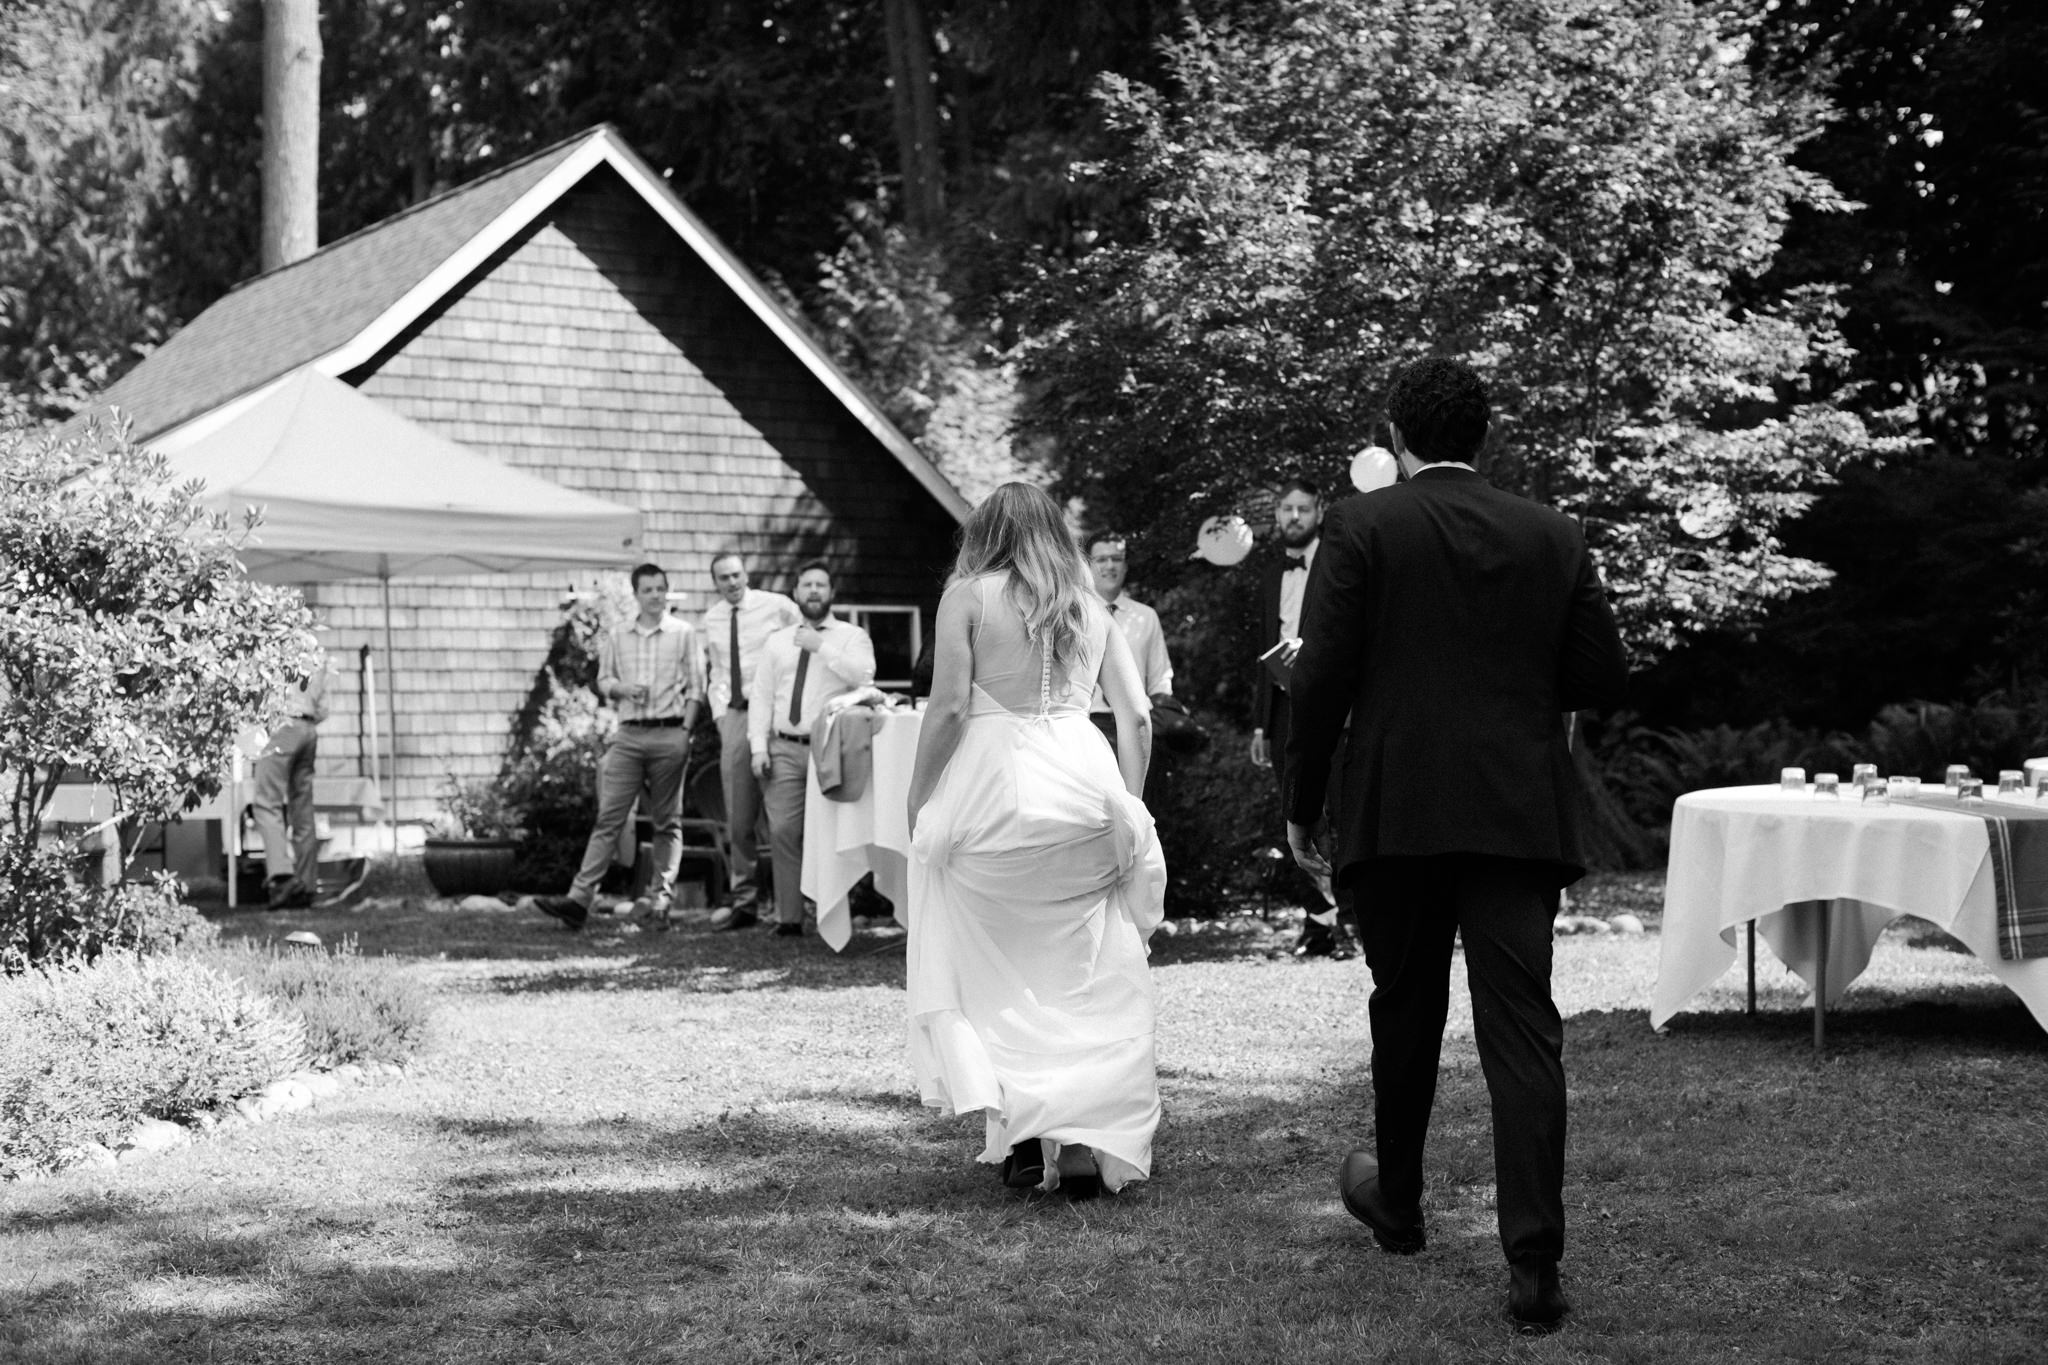 Backyard-Bainbridge-Island-Wedding-Alycia-Lovell-Photography-37.JPG